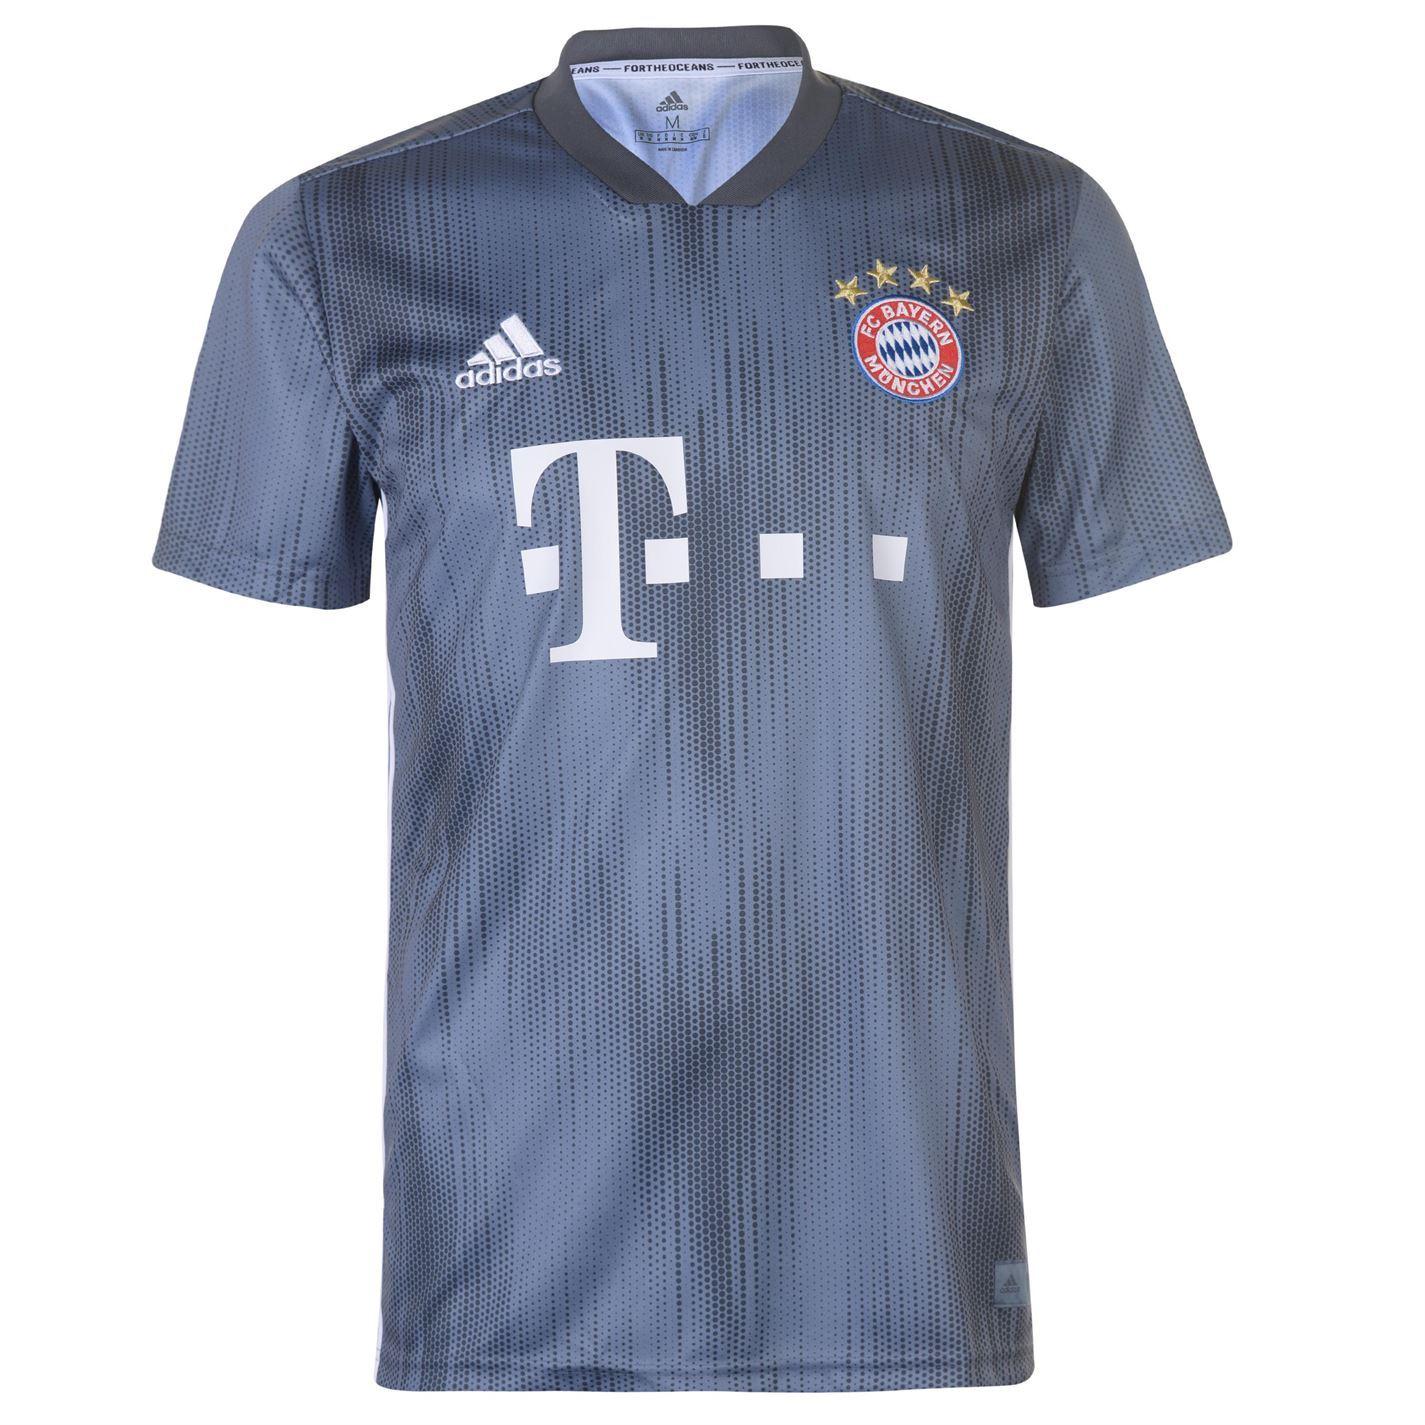 bc944d9b ... adidas Bayern Munich Third Jersey 2018 2019 Mens Grey Football Soccer  Shirt Top ...